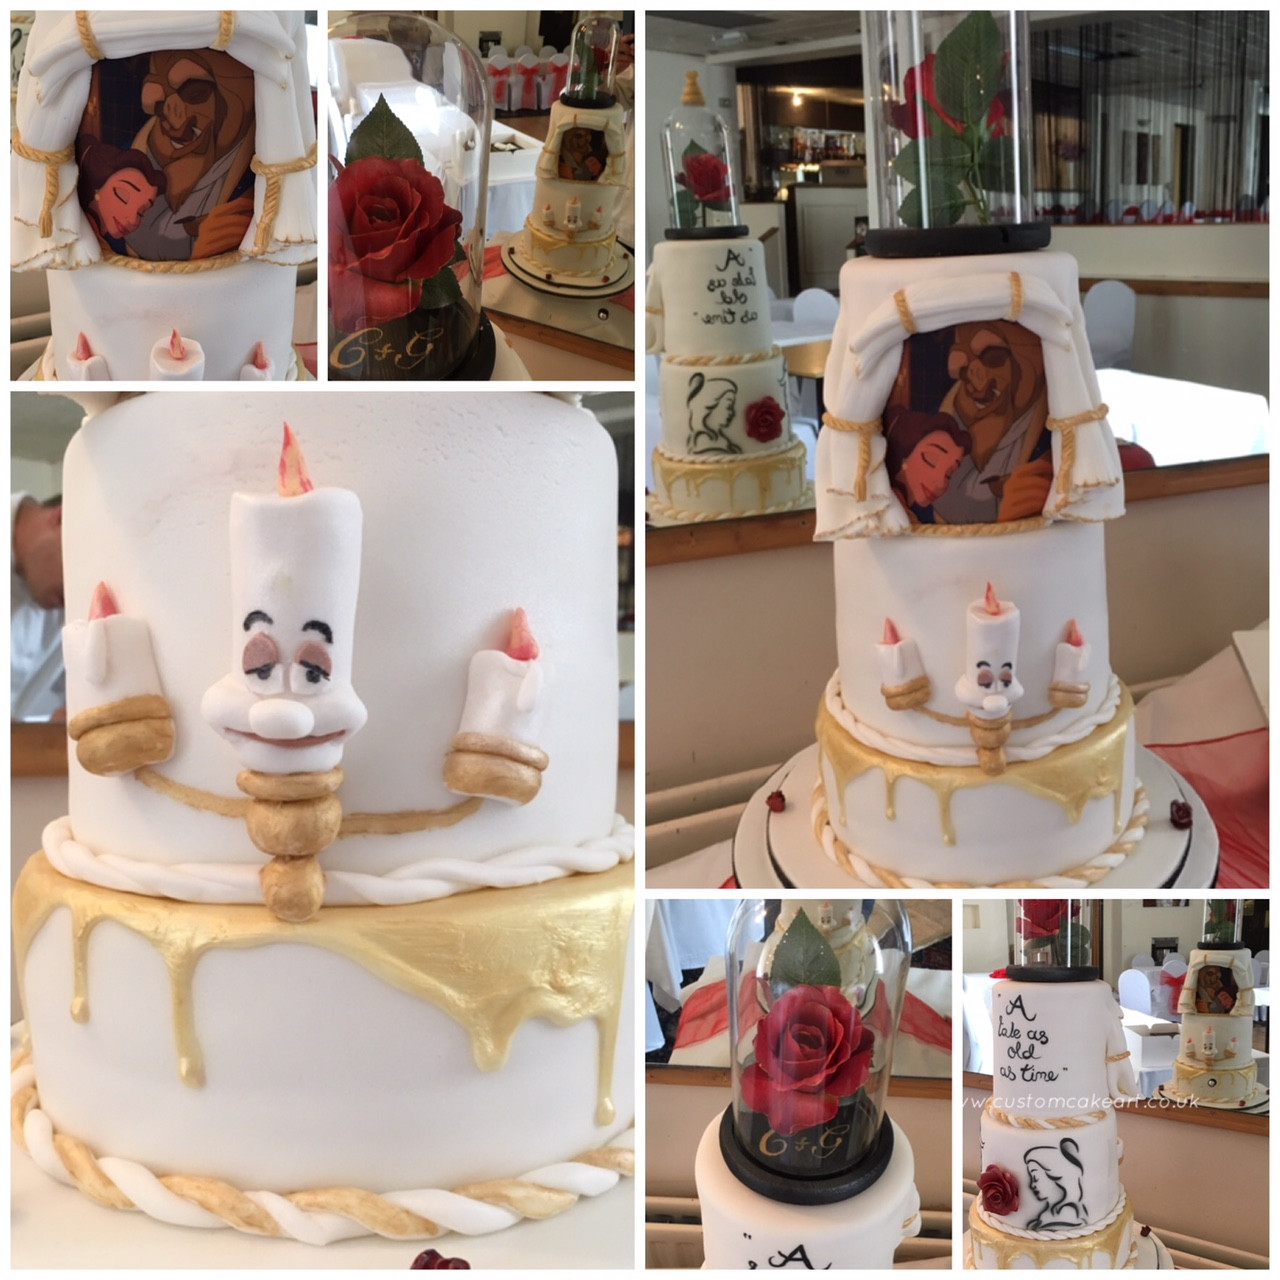 Beauty And The Beast Wedding Cake.Beauty And The Beast Wedding Cake